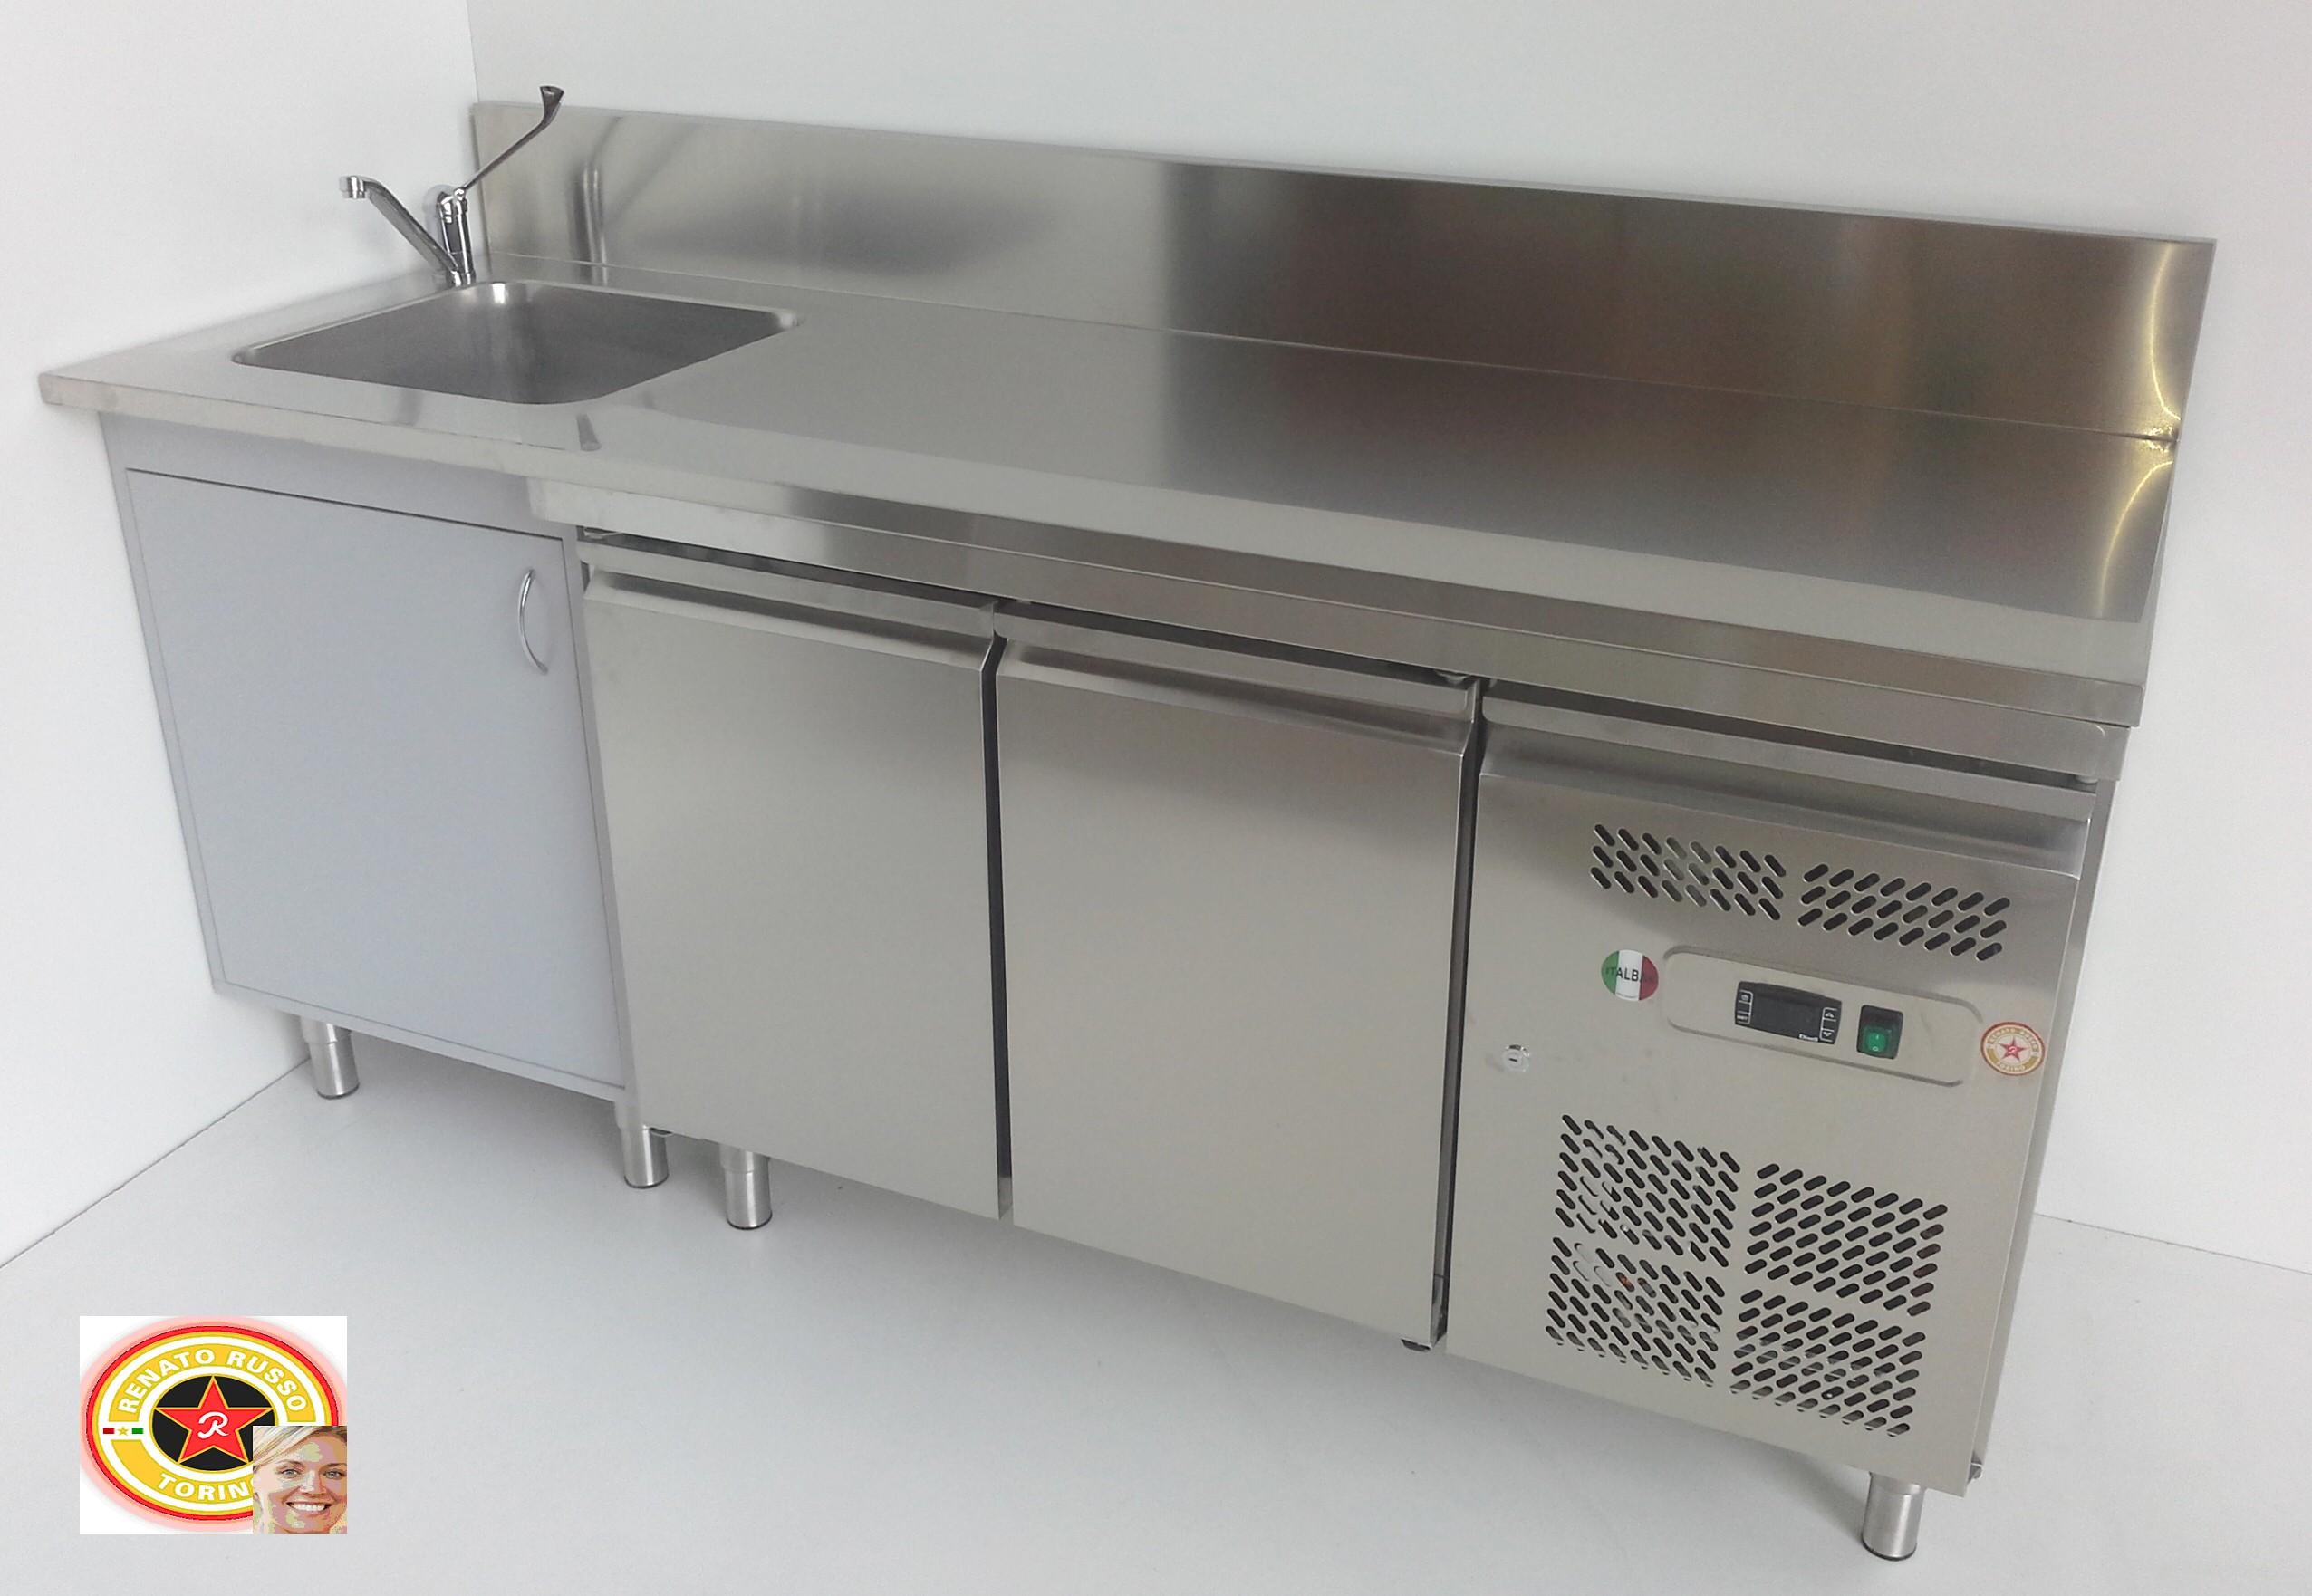 Banchi frigo dal 1980 produttori di banchi frigo for Bancone bar prezzi